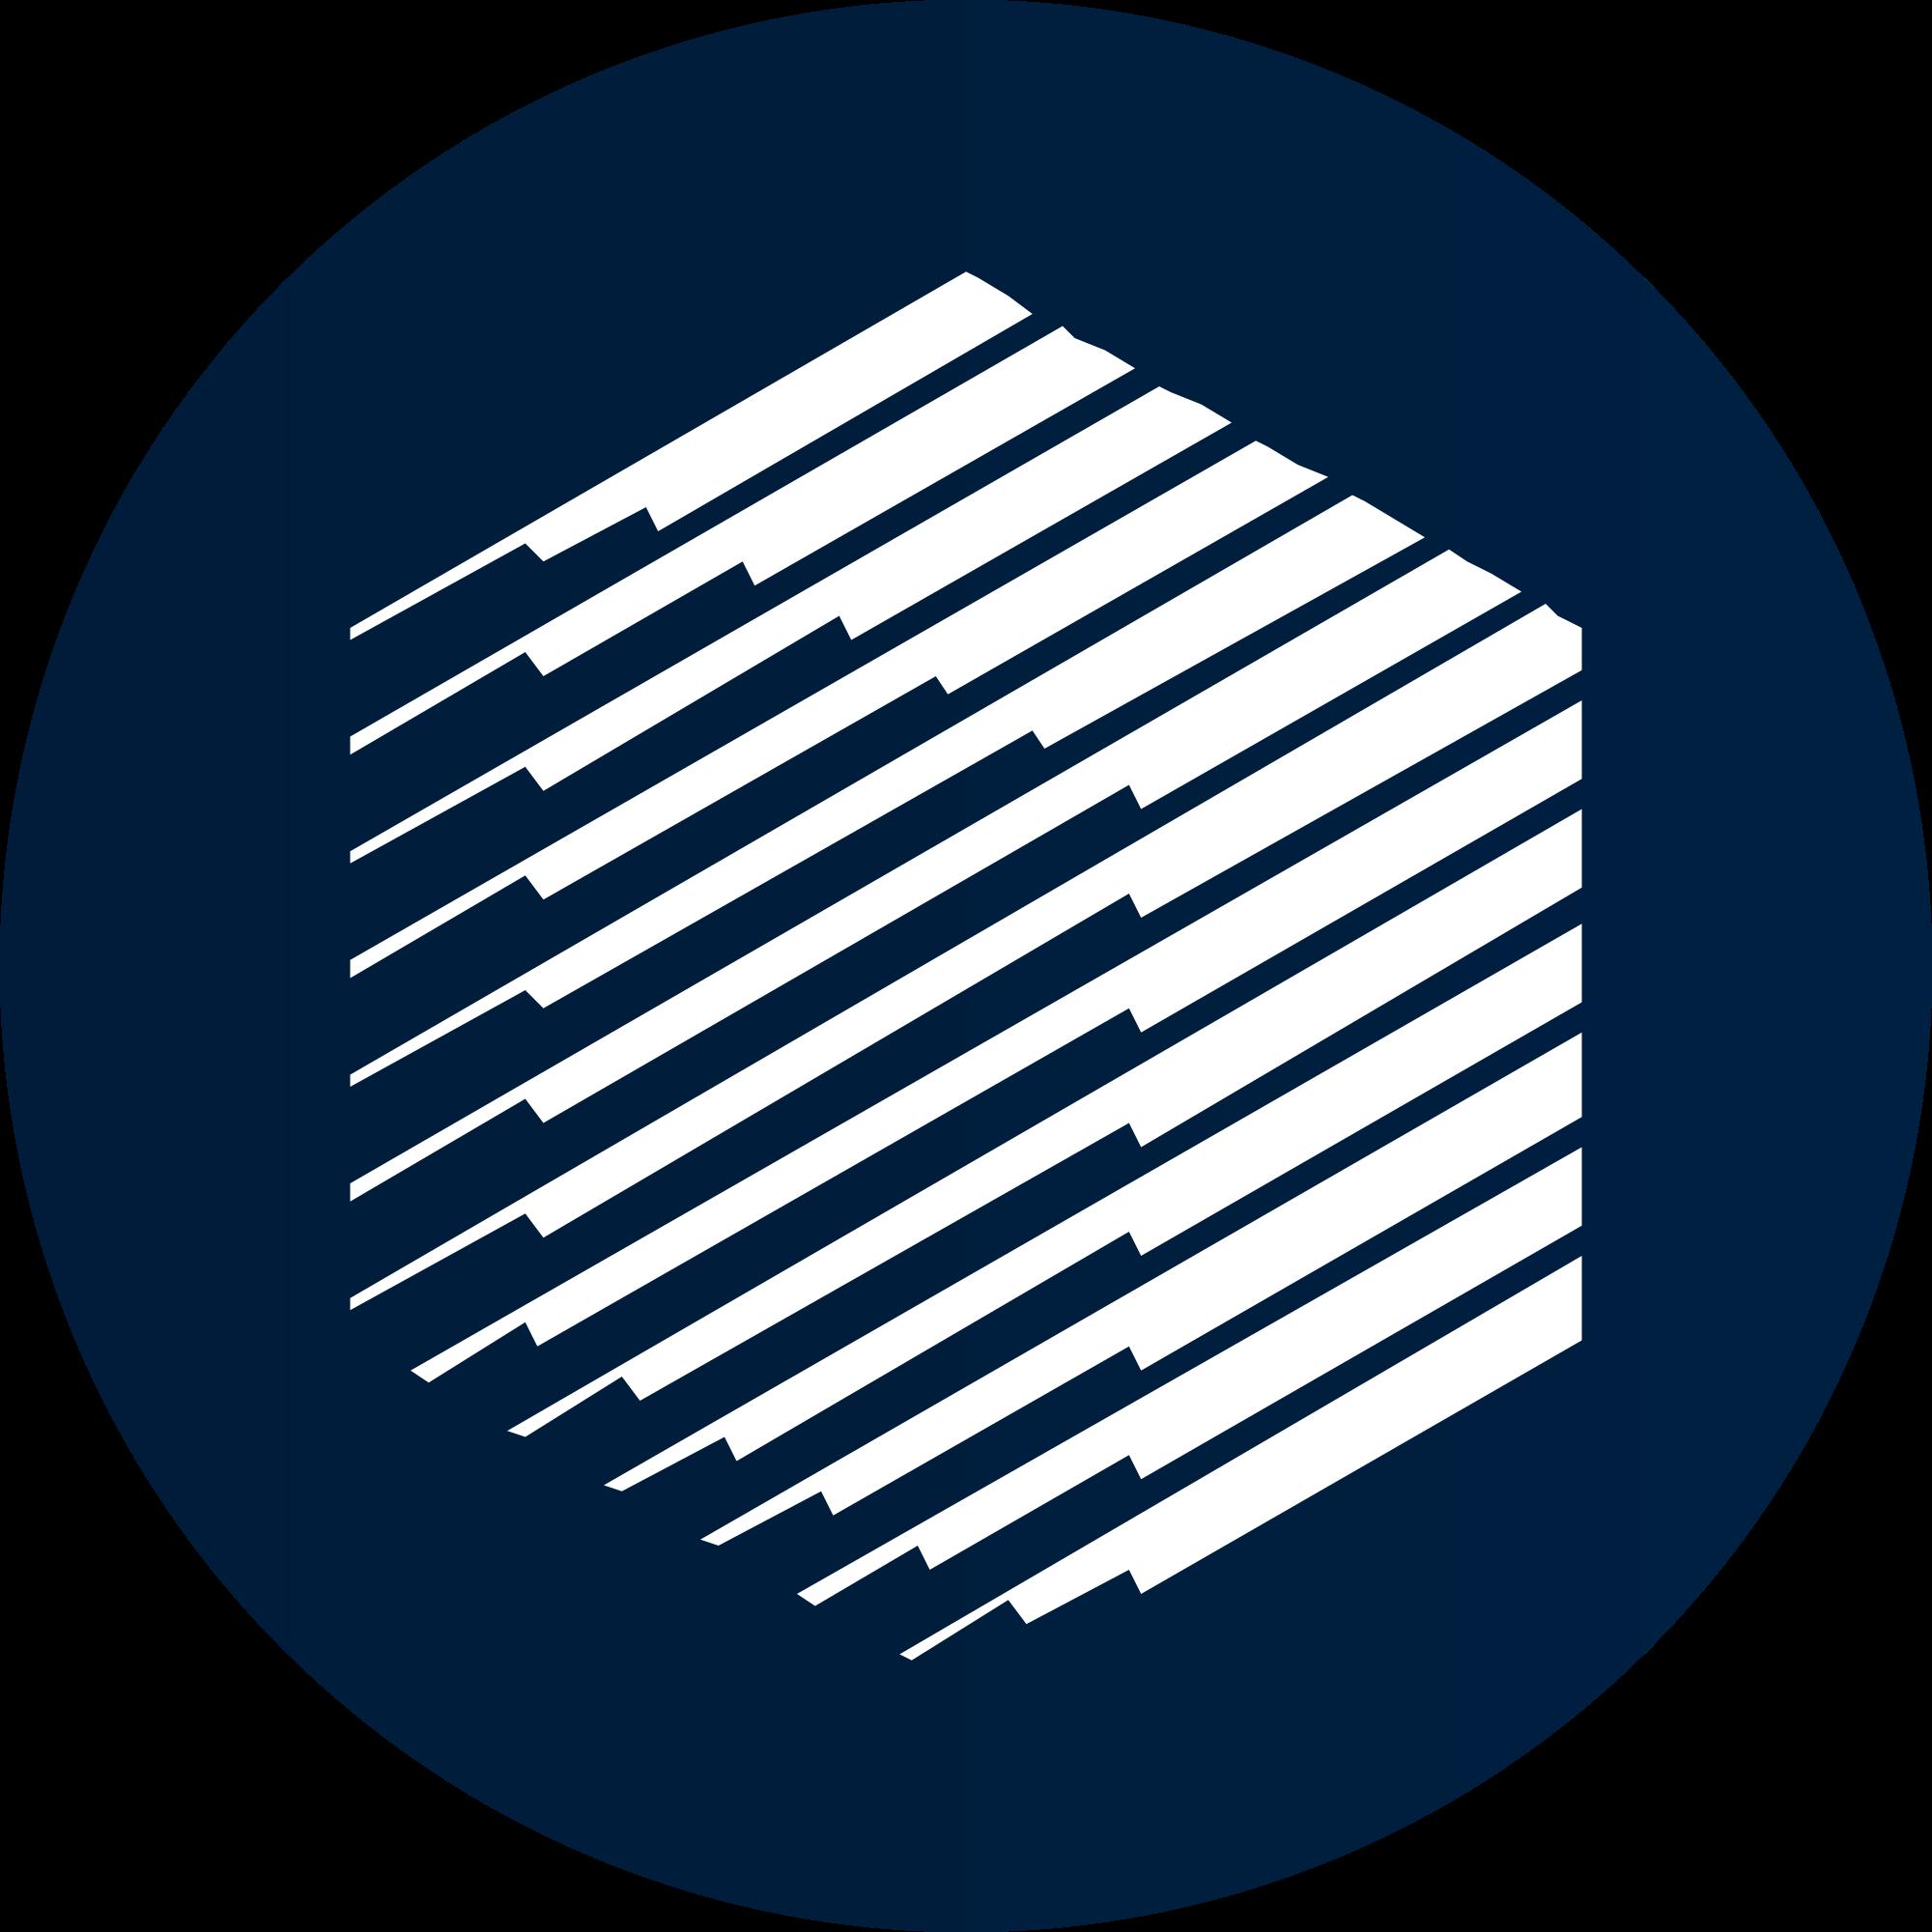 Ren (REN) Logo .SVG and .PNG Files Download